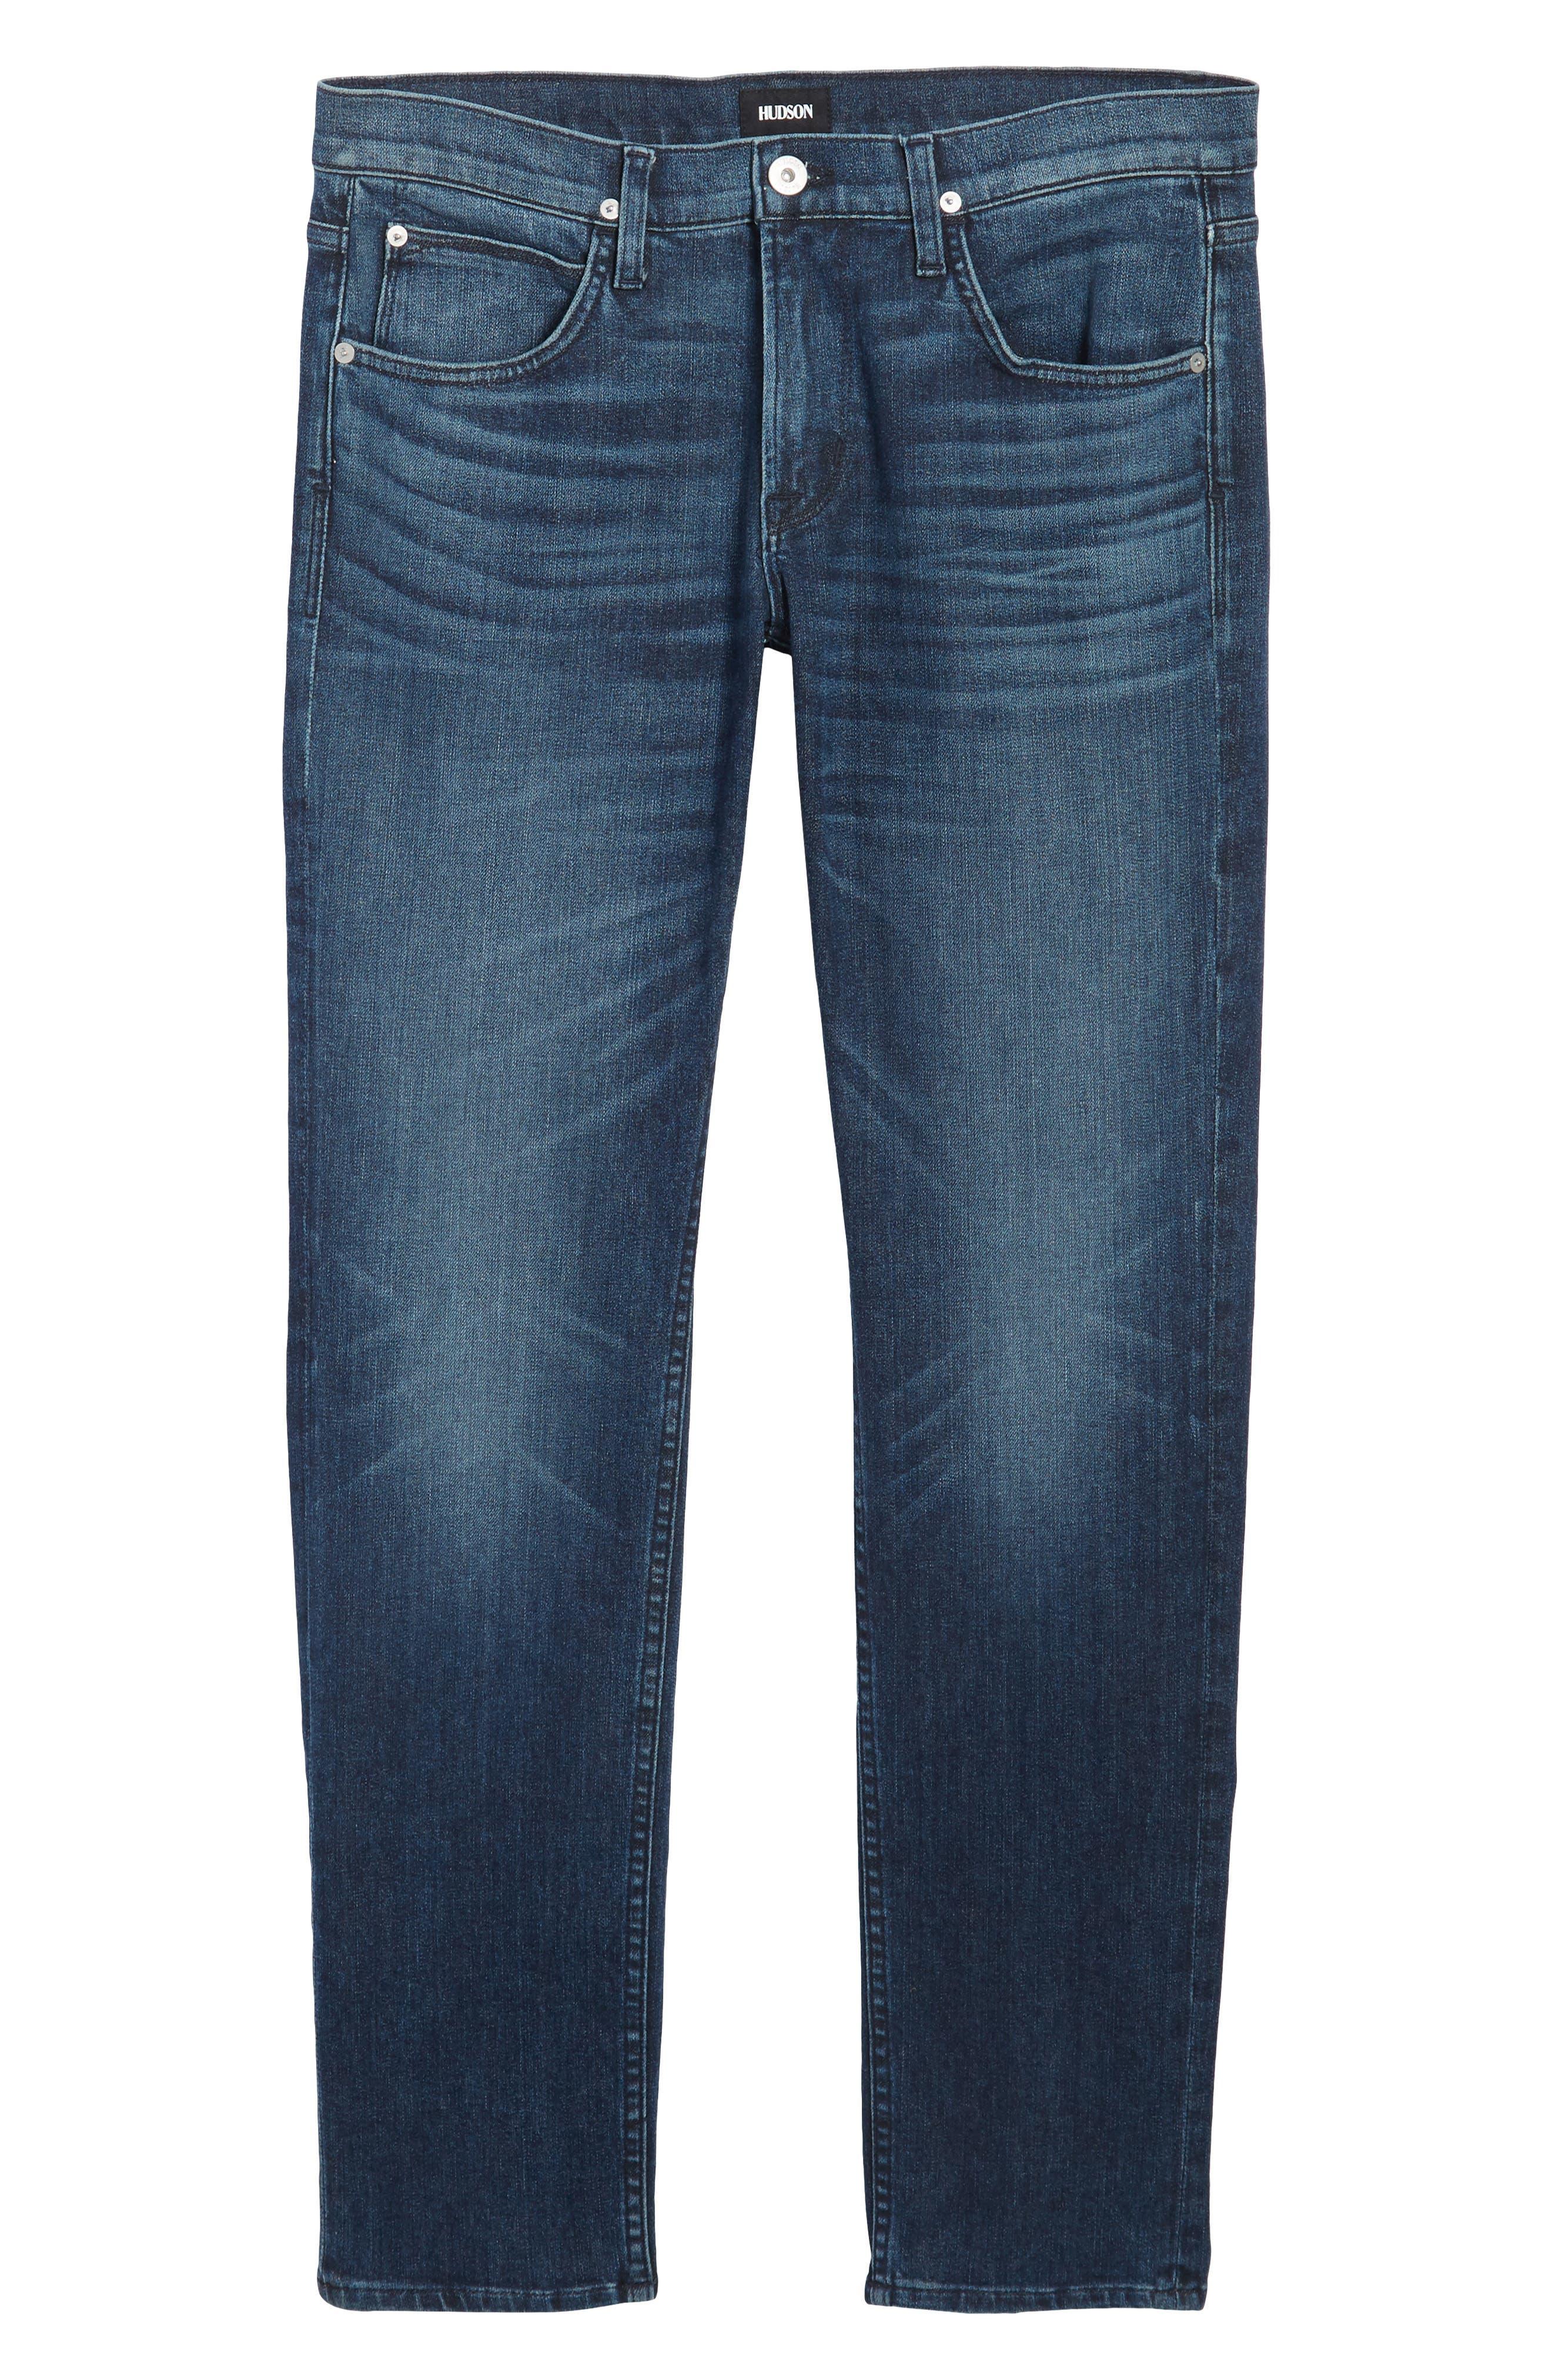 Blake Slim Fit Jeans,                             Alternate thumbnail 6, color,                             Regret